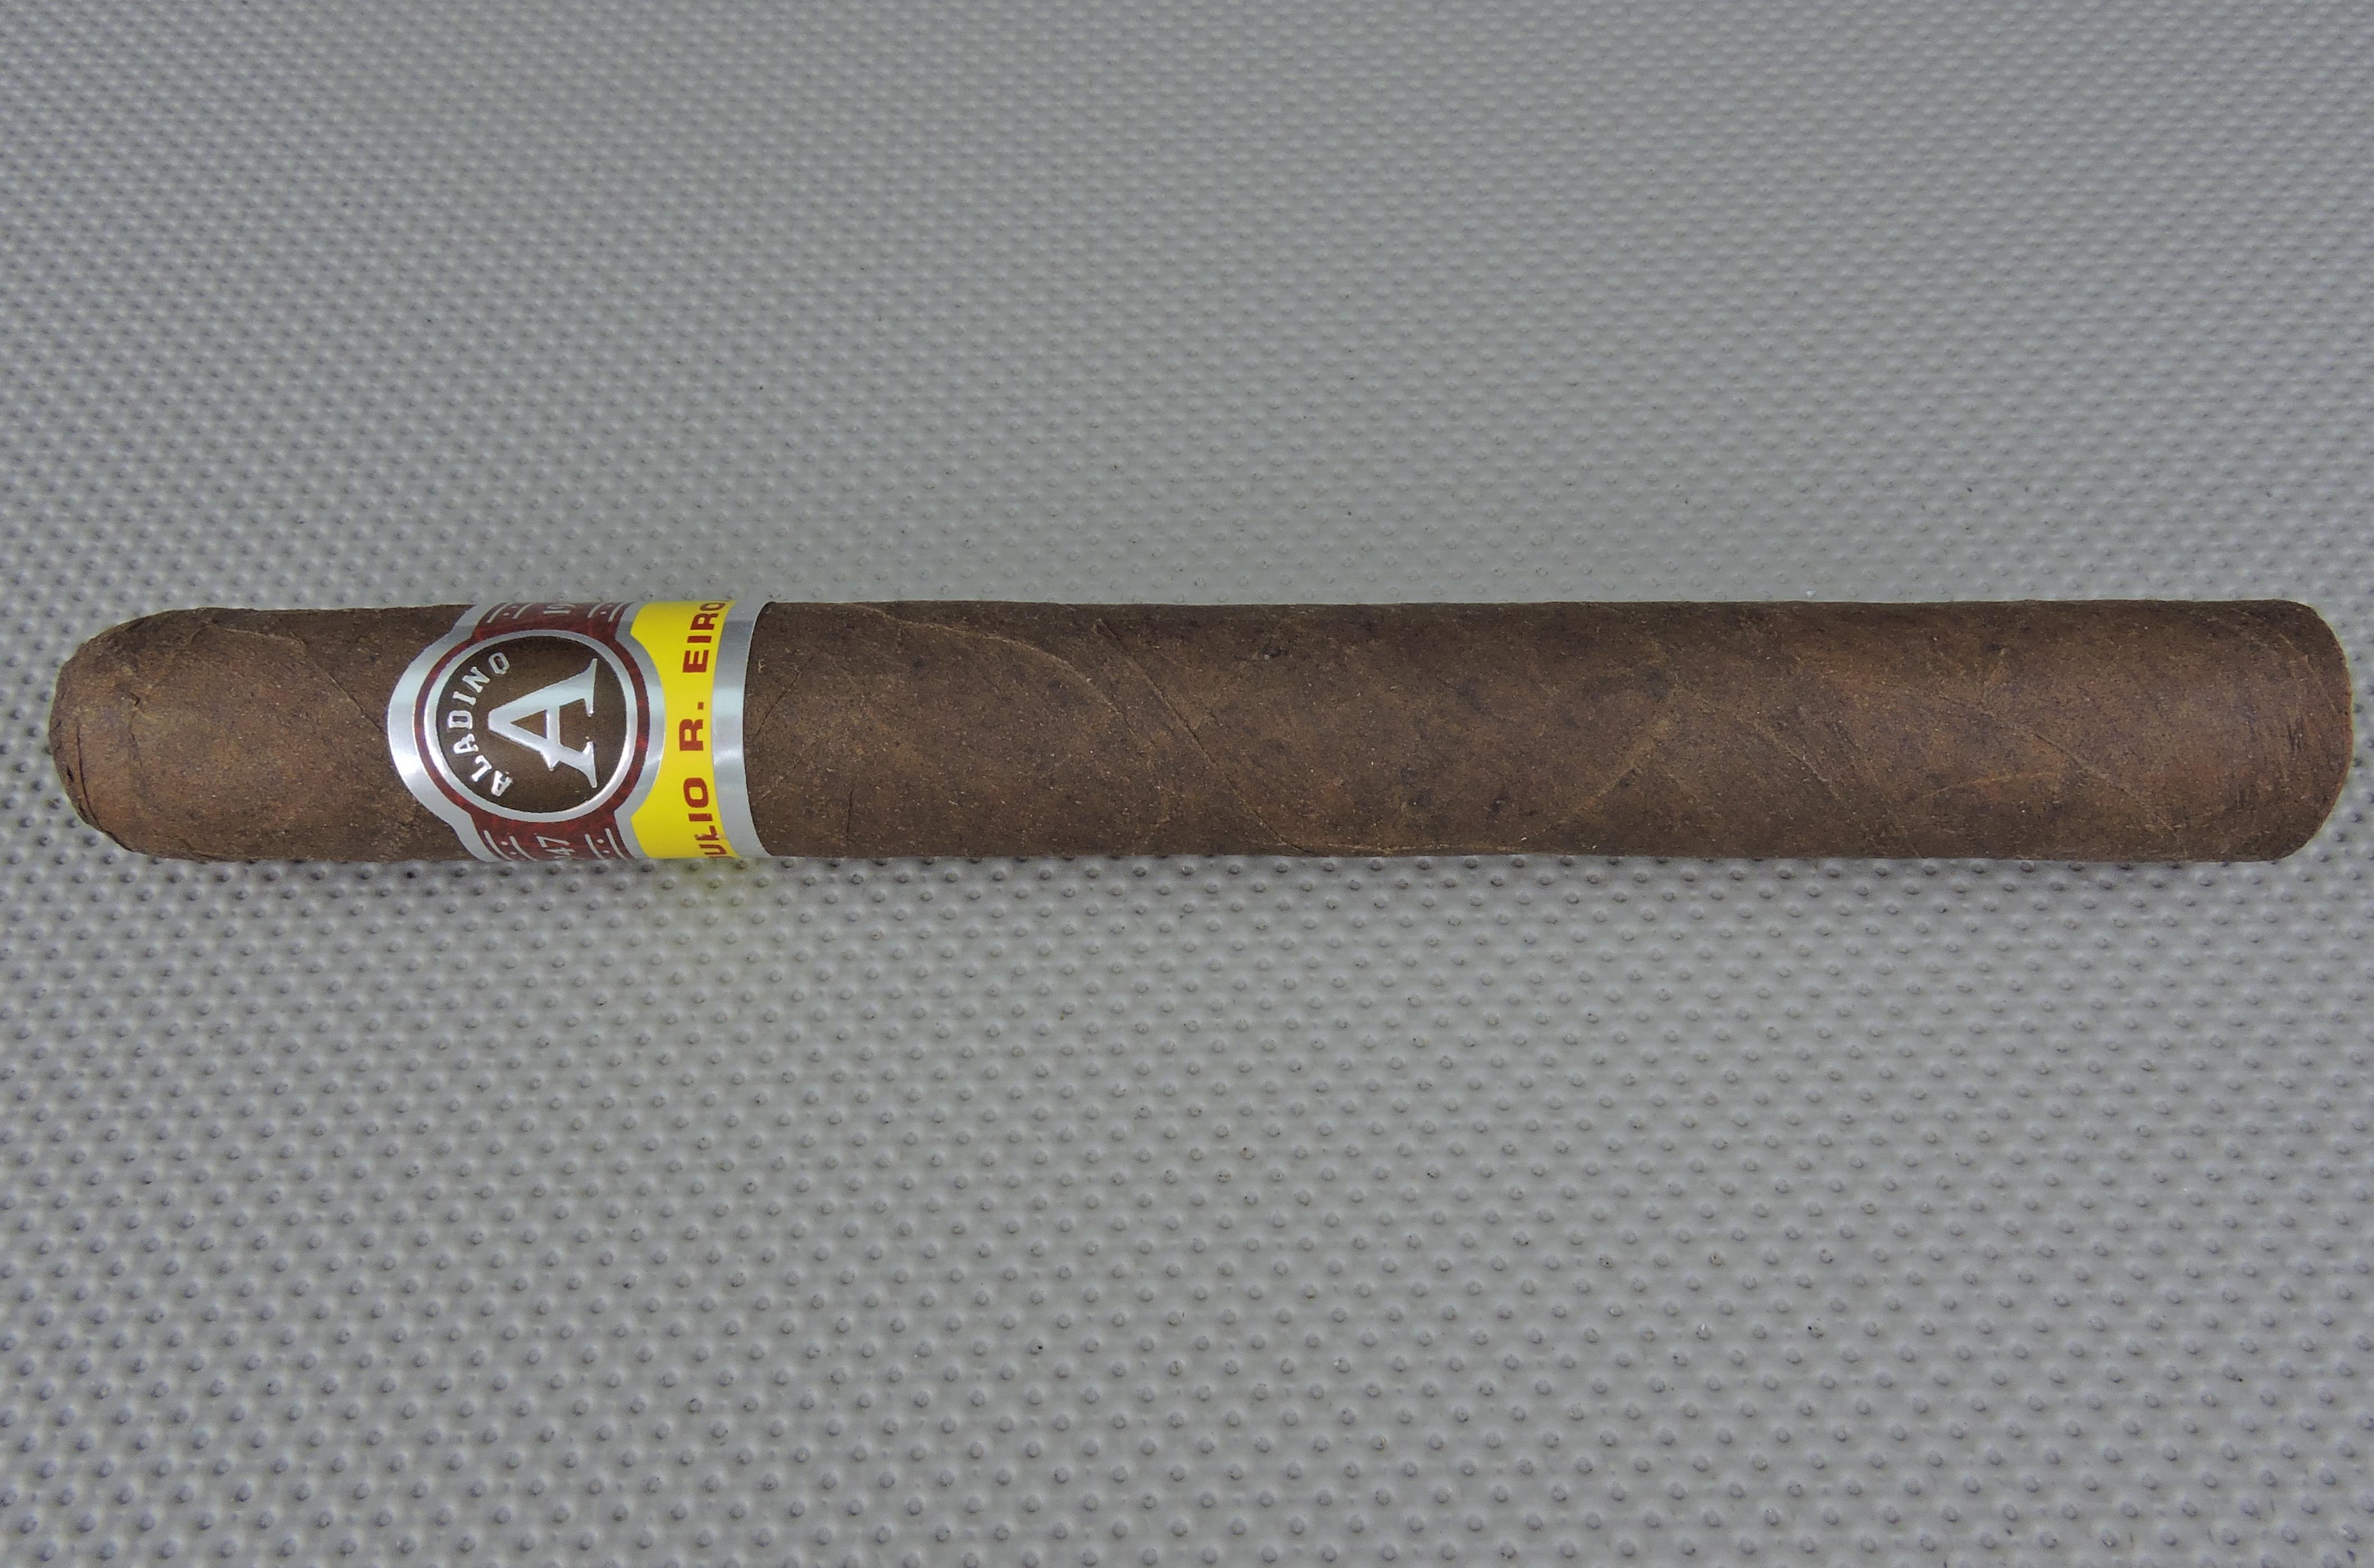 Cigar Review: Aladino Maduro Cazador by JRE Tobacco Co